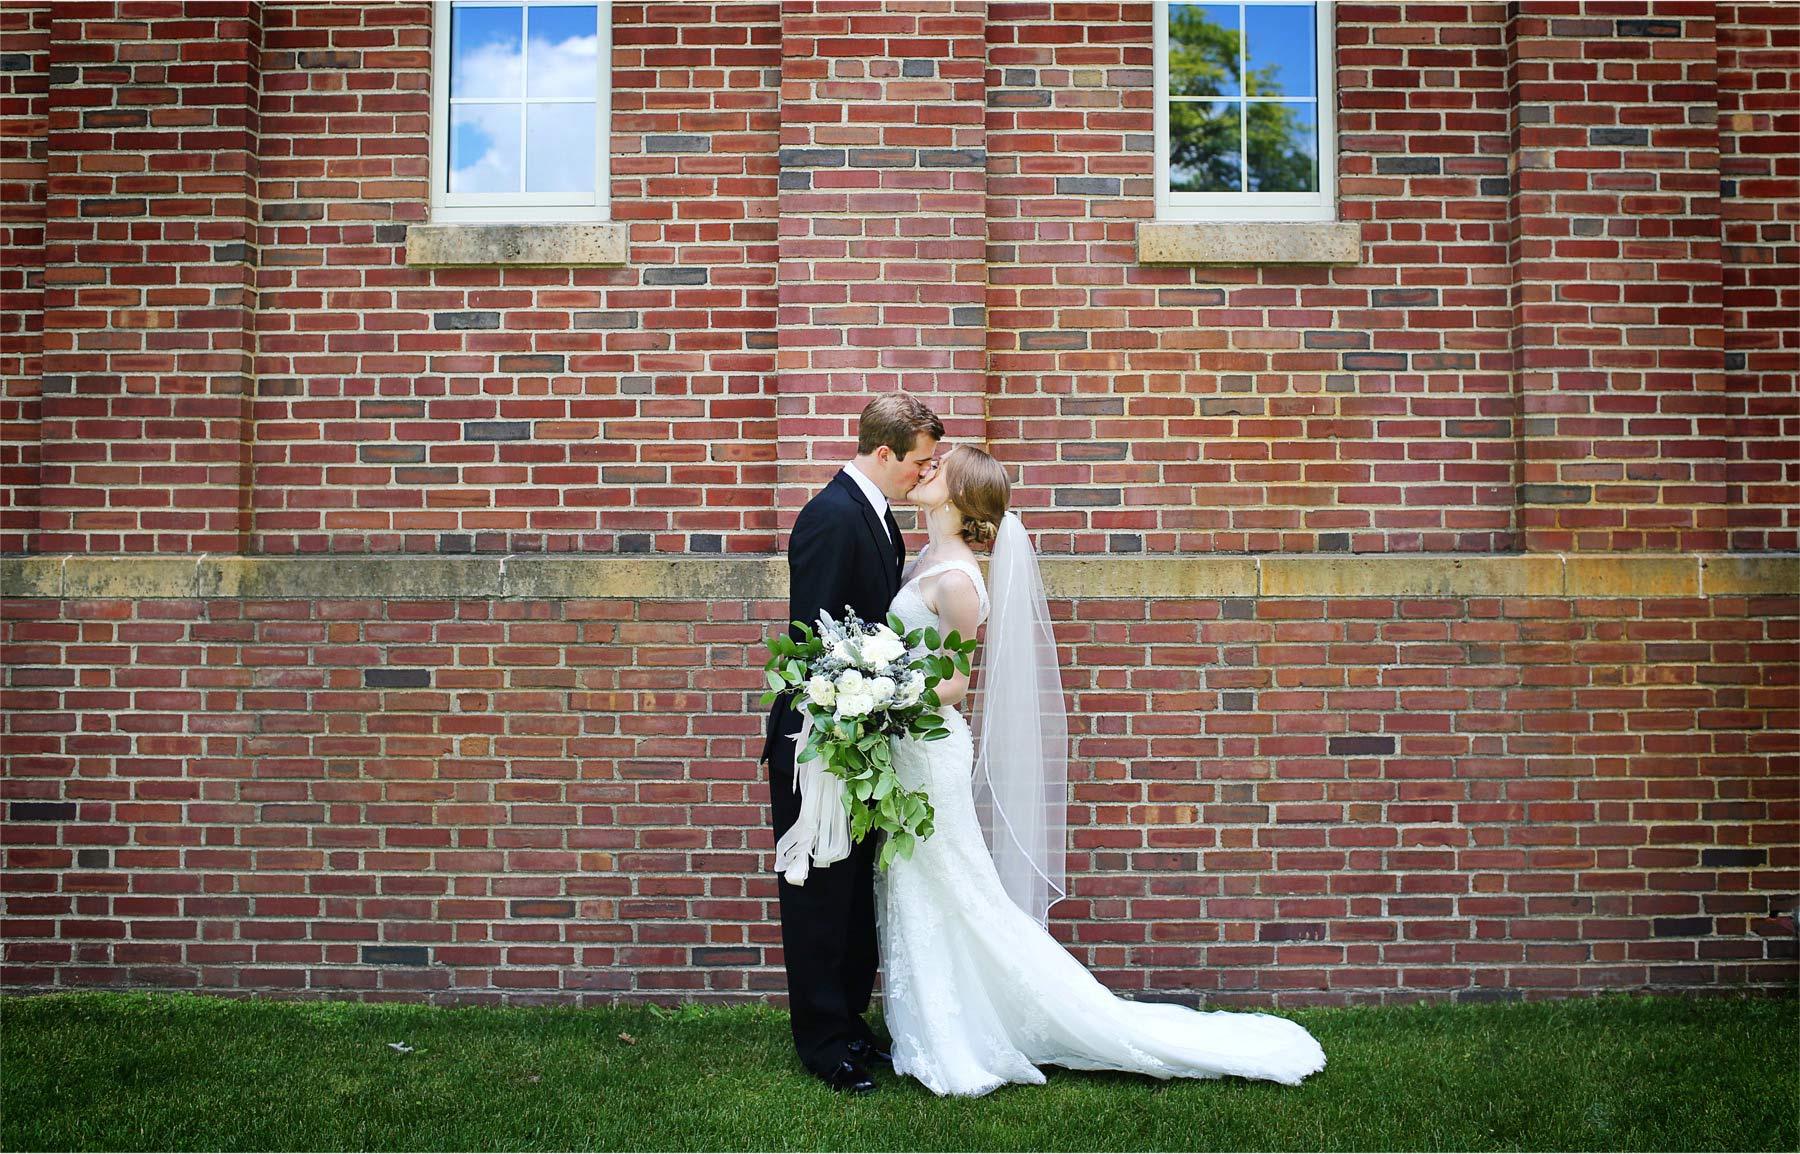 08-Edina-Minnesota-Wedding-Photographer-by-Andrew-Vick-Photography-Summer-Our-Lady-of-Grace-Catholic-Parish-Church-Bride-Groom-First-Look-Meeting-Kiss-Embrace-Betsy-and-Jon.jpg